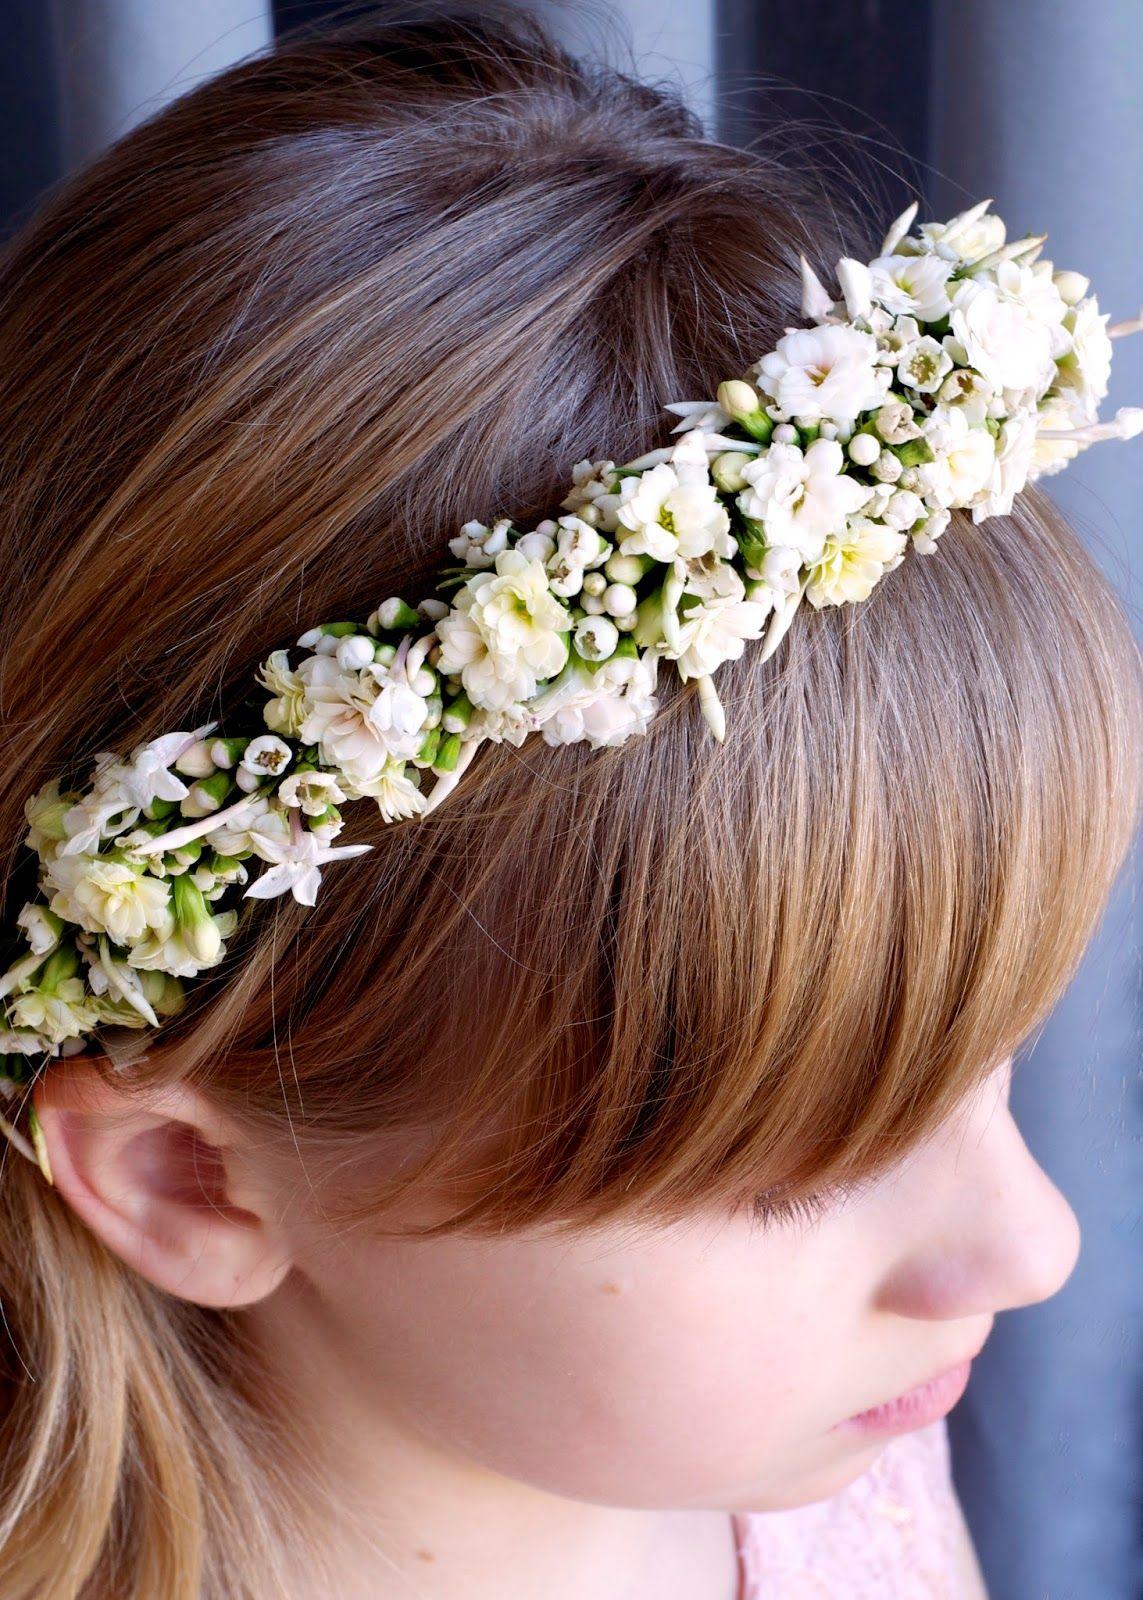 Blog O Kwiatach Wedding Flower Girl Childrens Hairstyles Girls Crown